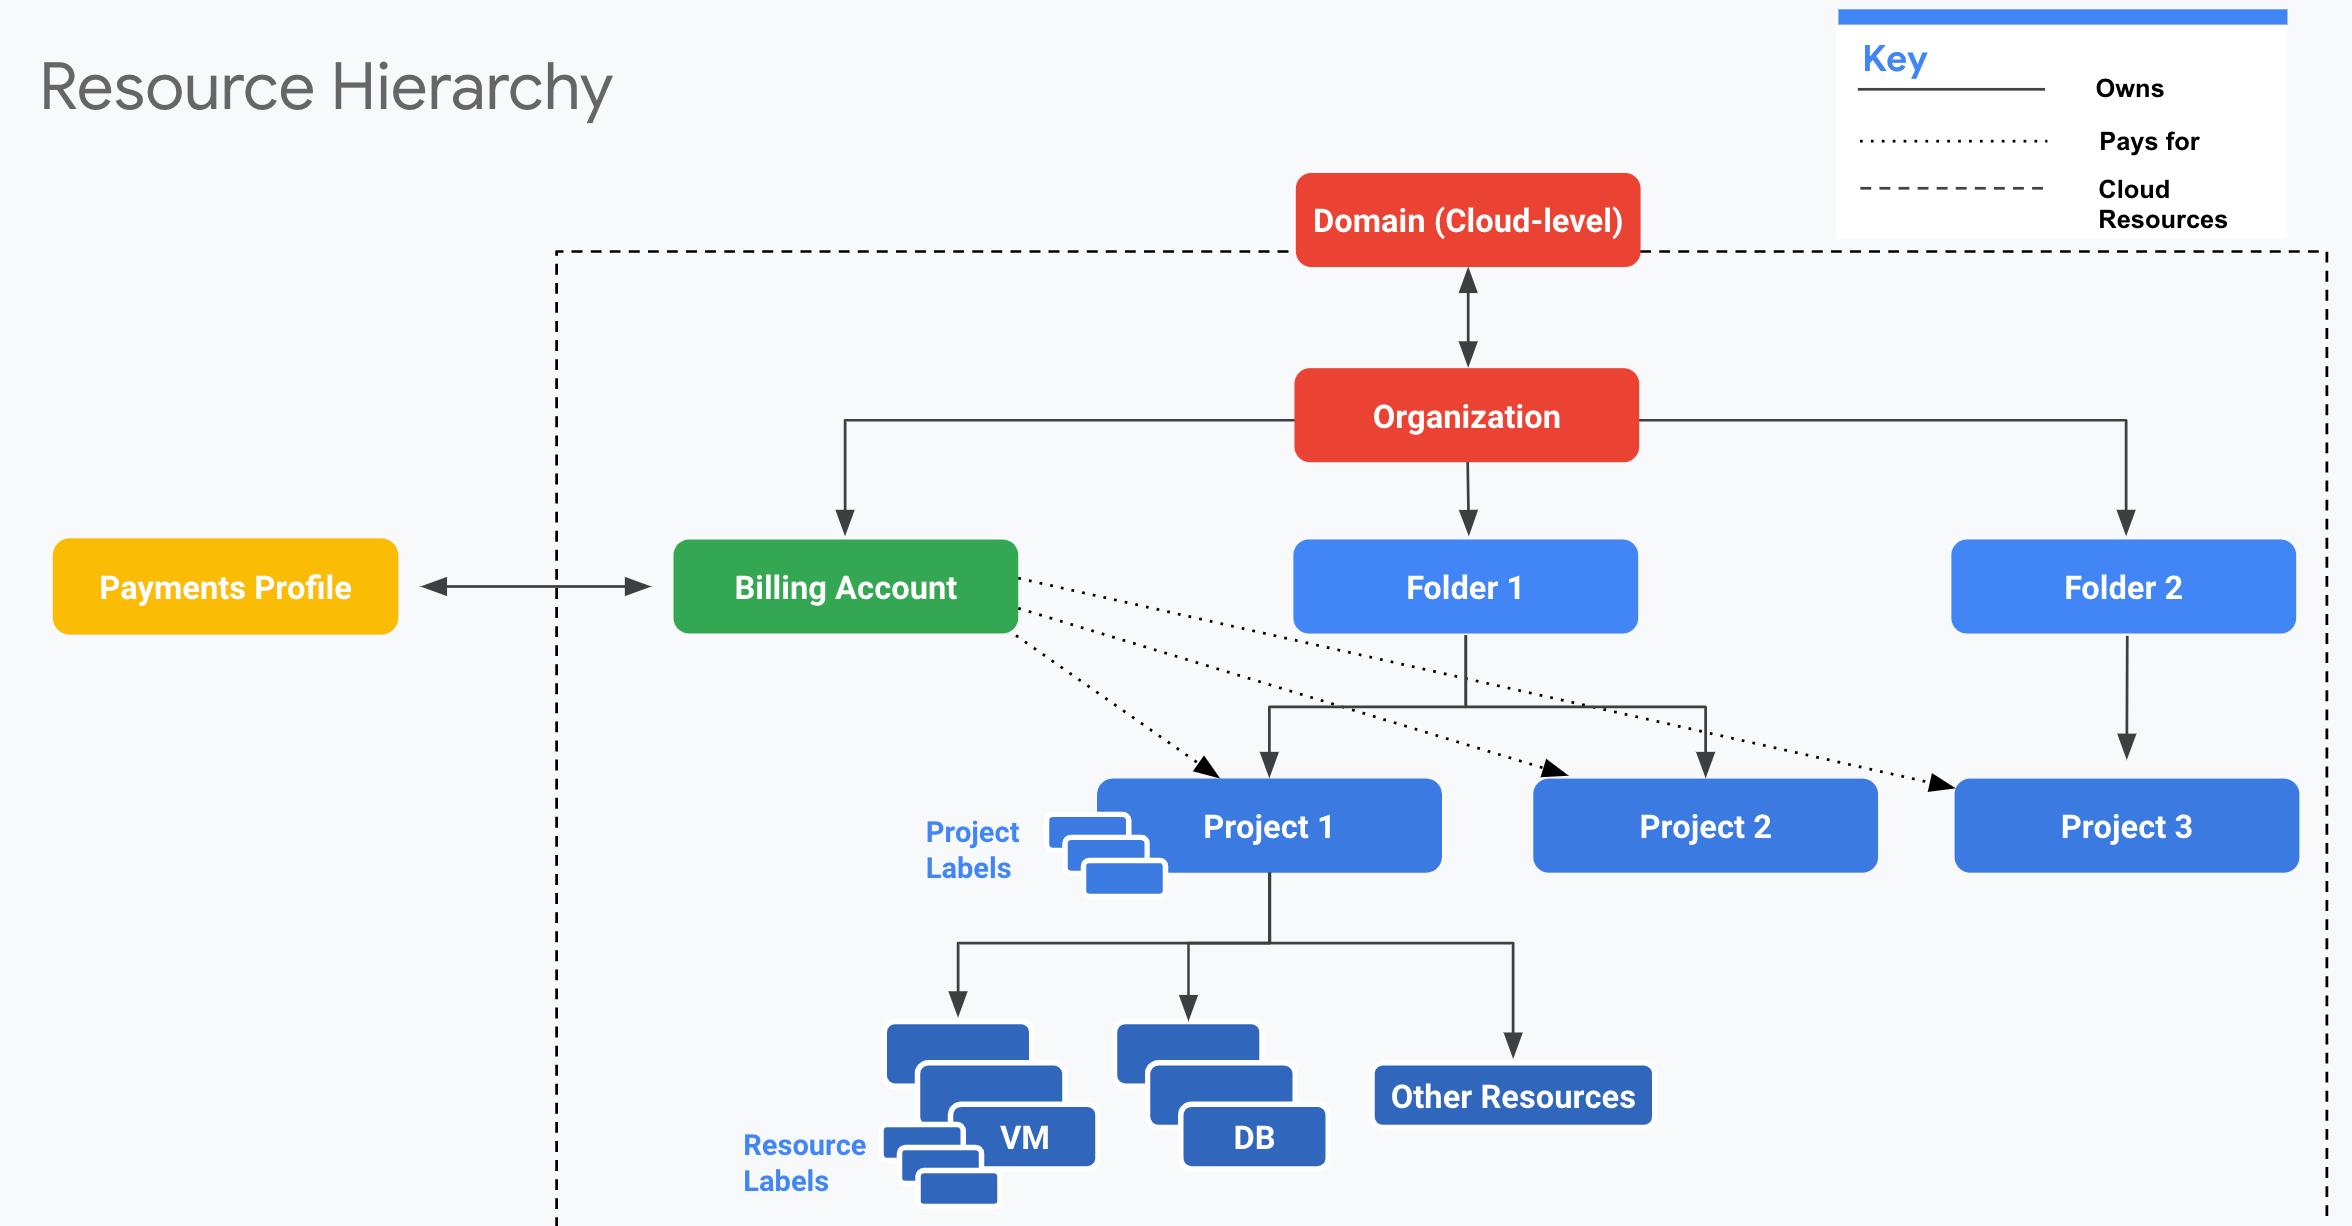 Google Cloud 계정 관리와 관련된 핵심 계정 수준 리소스와 Cloud Billing 계정 및 결제 프로필과의 연관성을 보여주는 리소스 계층 구조 예시입니다.